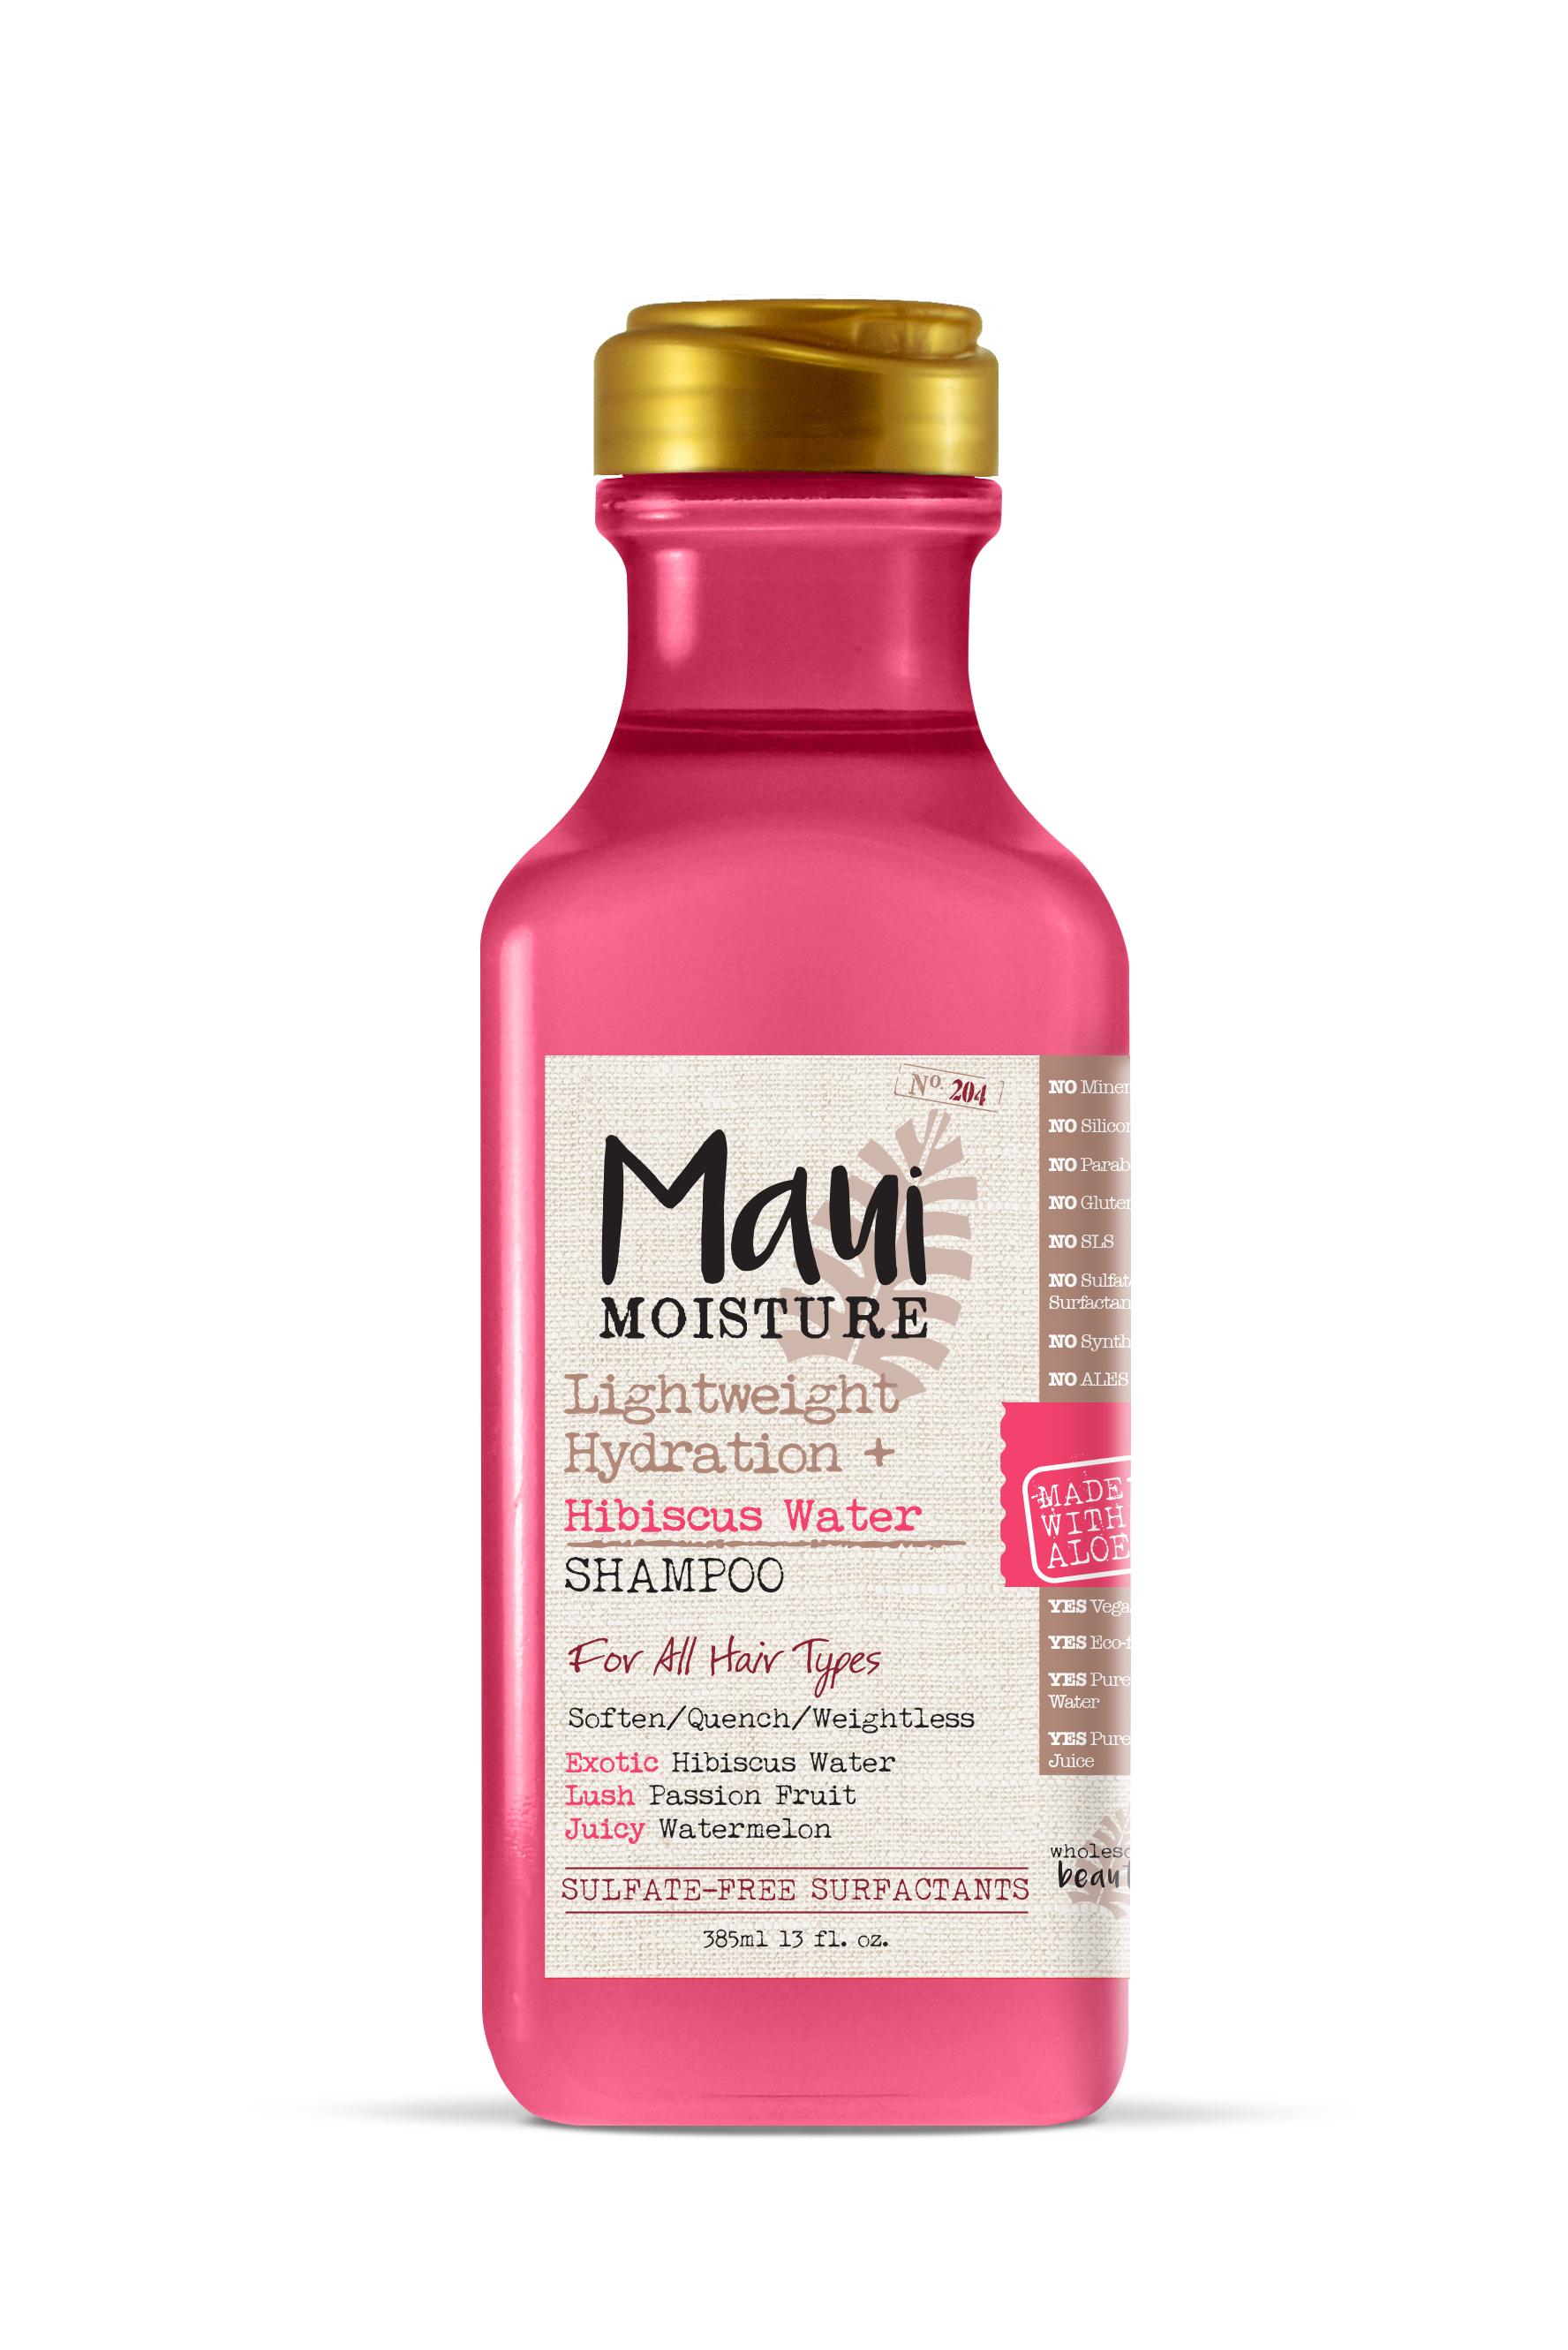 Maui Moisture Lightweight Hydration Plus Hibiscus Water Shampoo